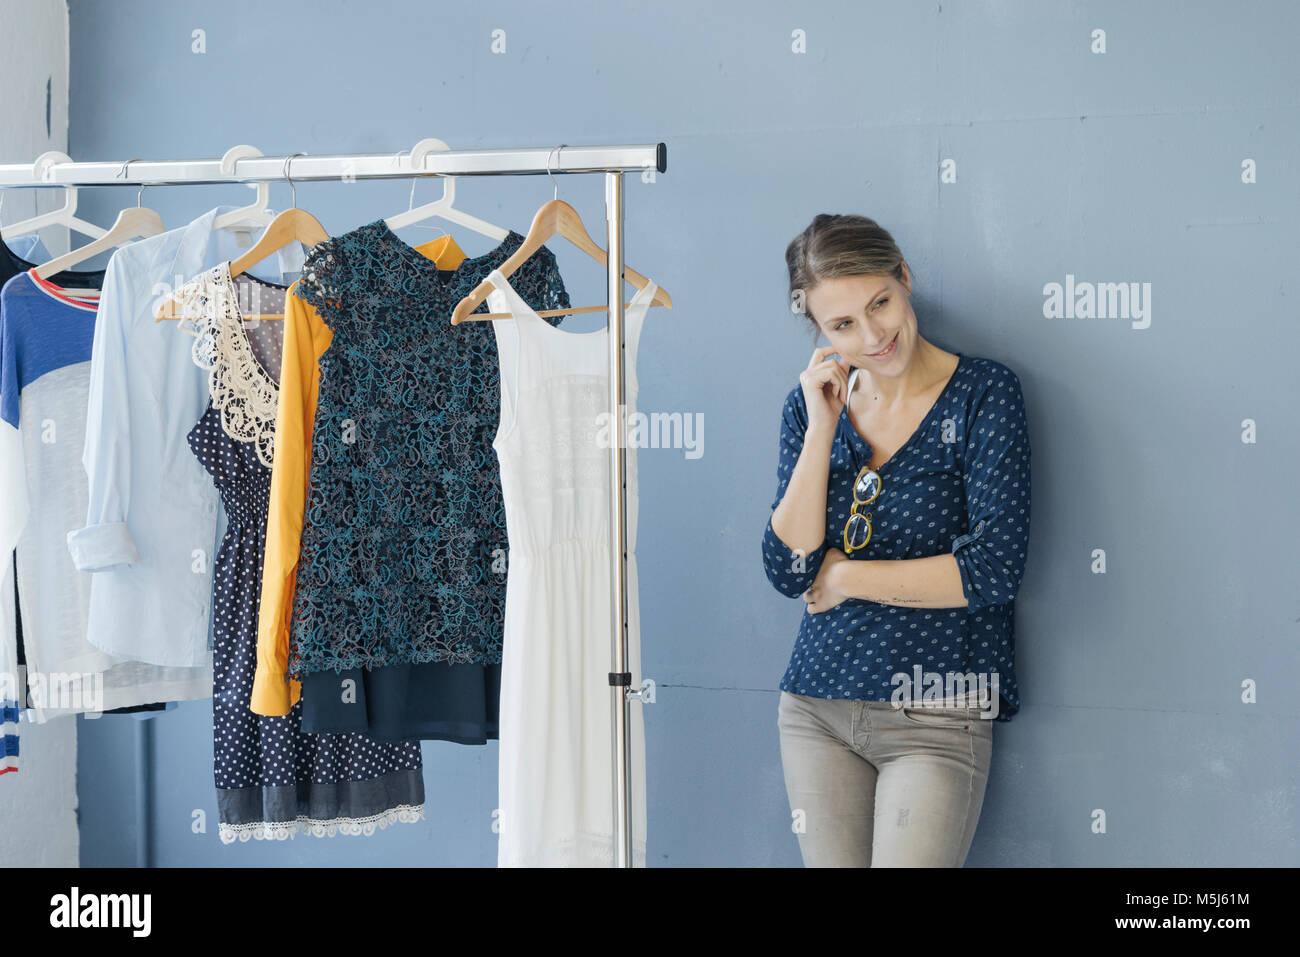 Portrait of smiling Fashion designer dans son studio leaning against wall Photo Stock